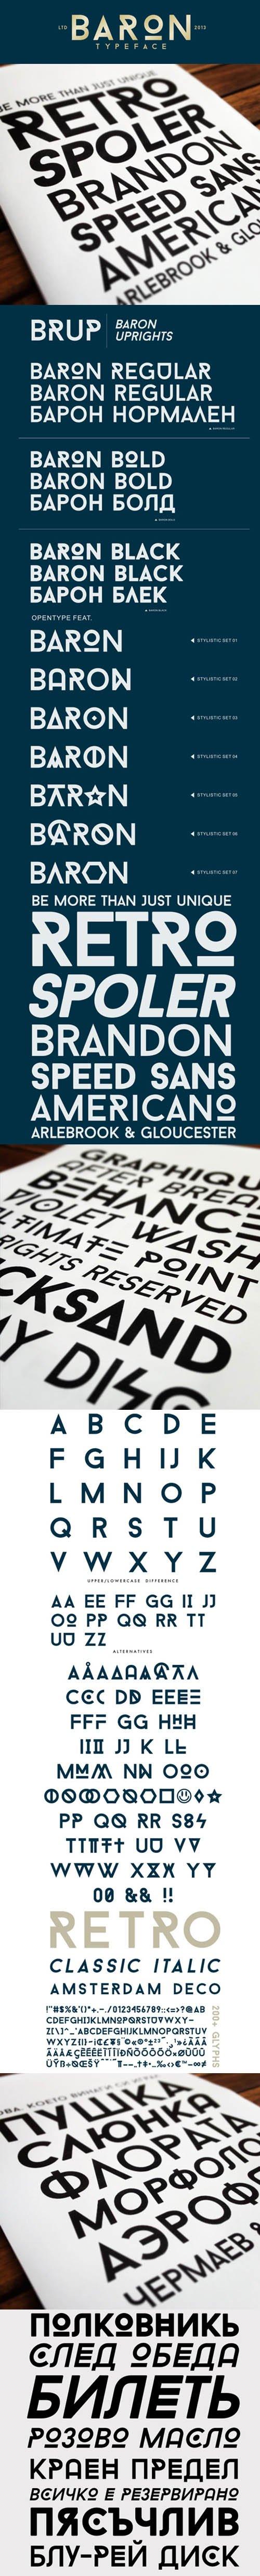 Baron Font - Decorative Sans Serif Family